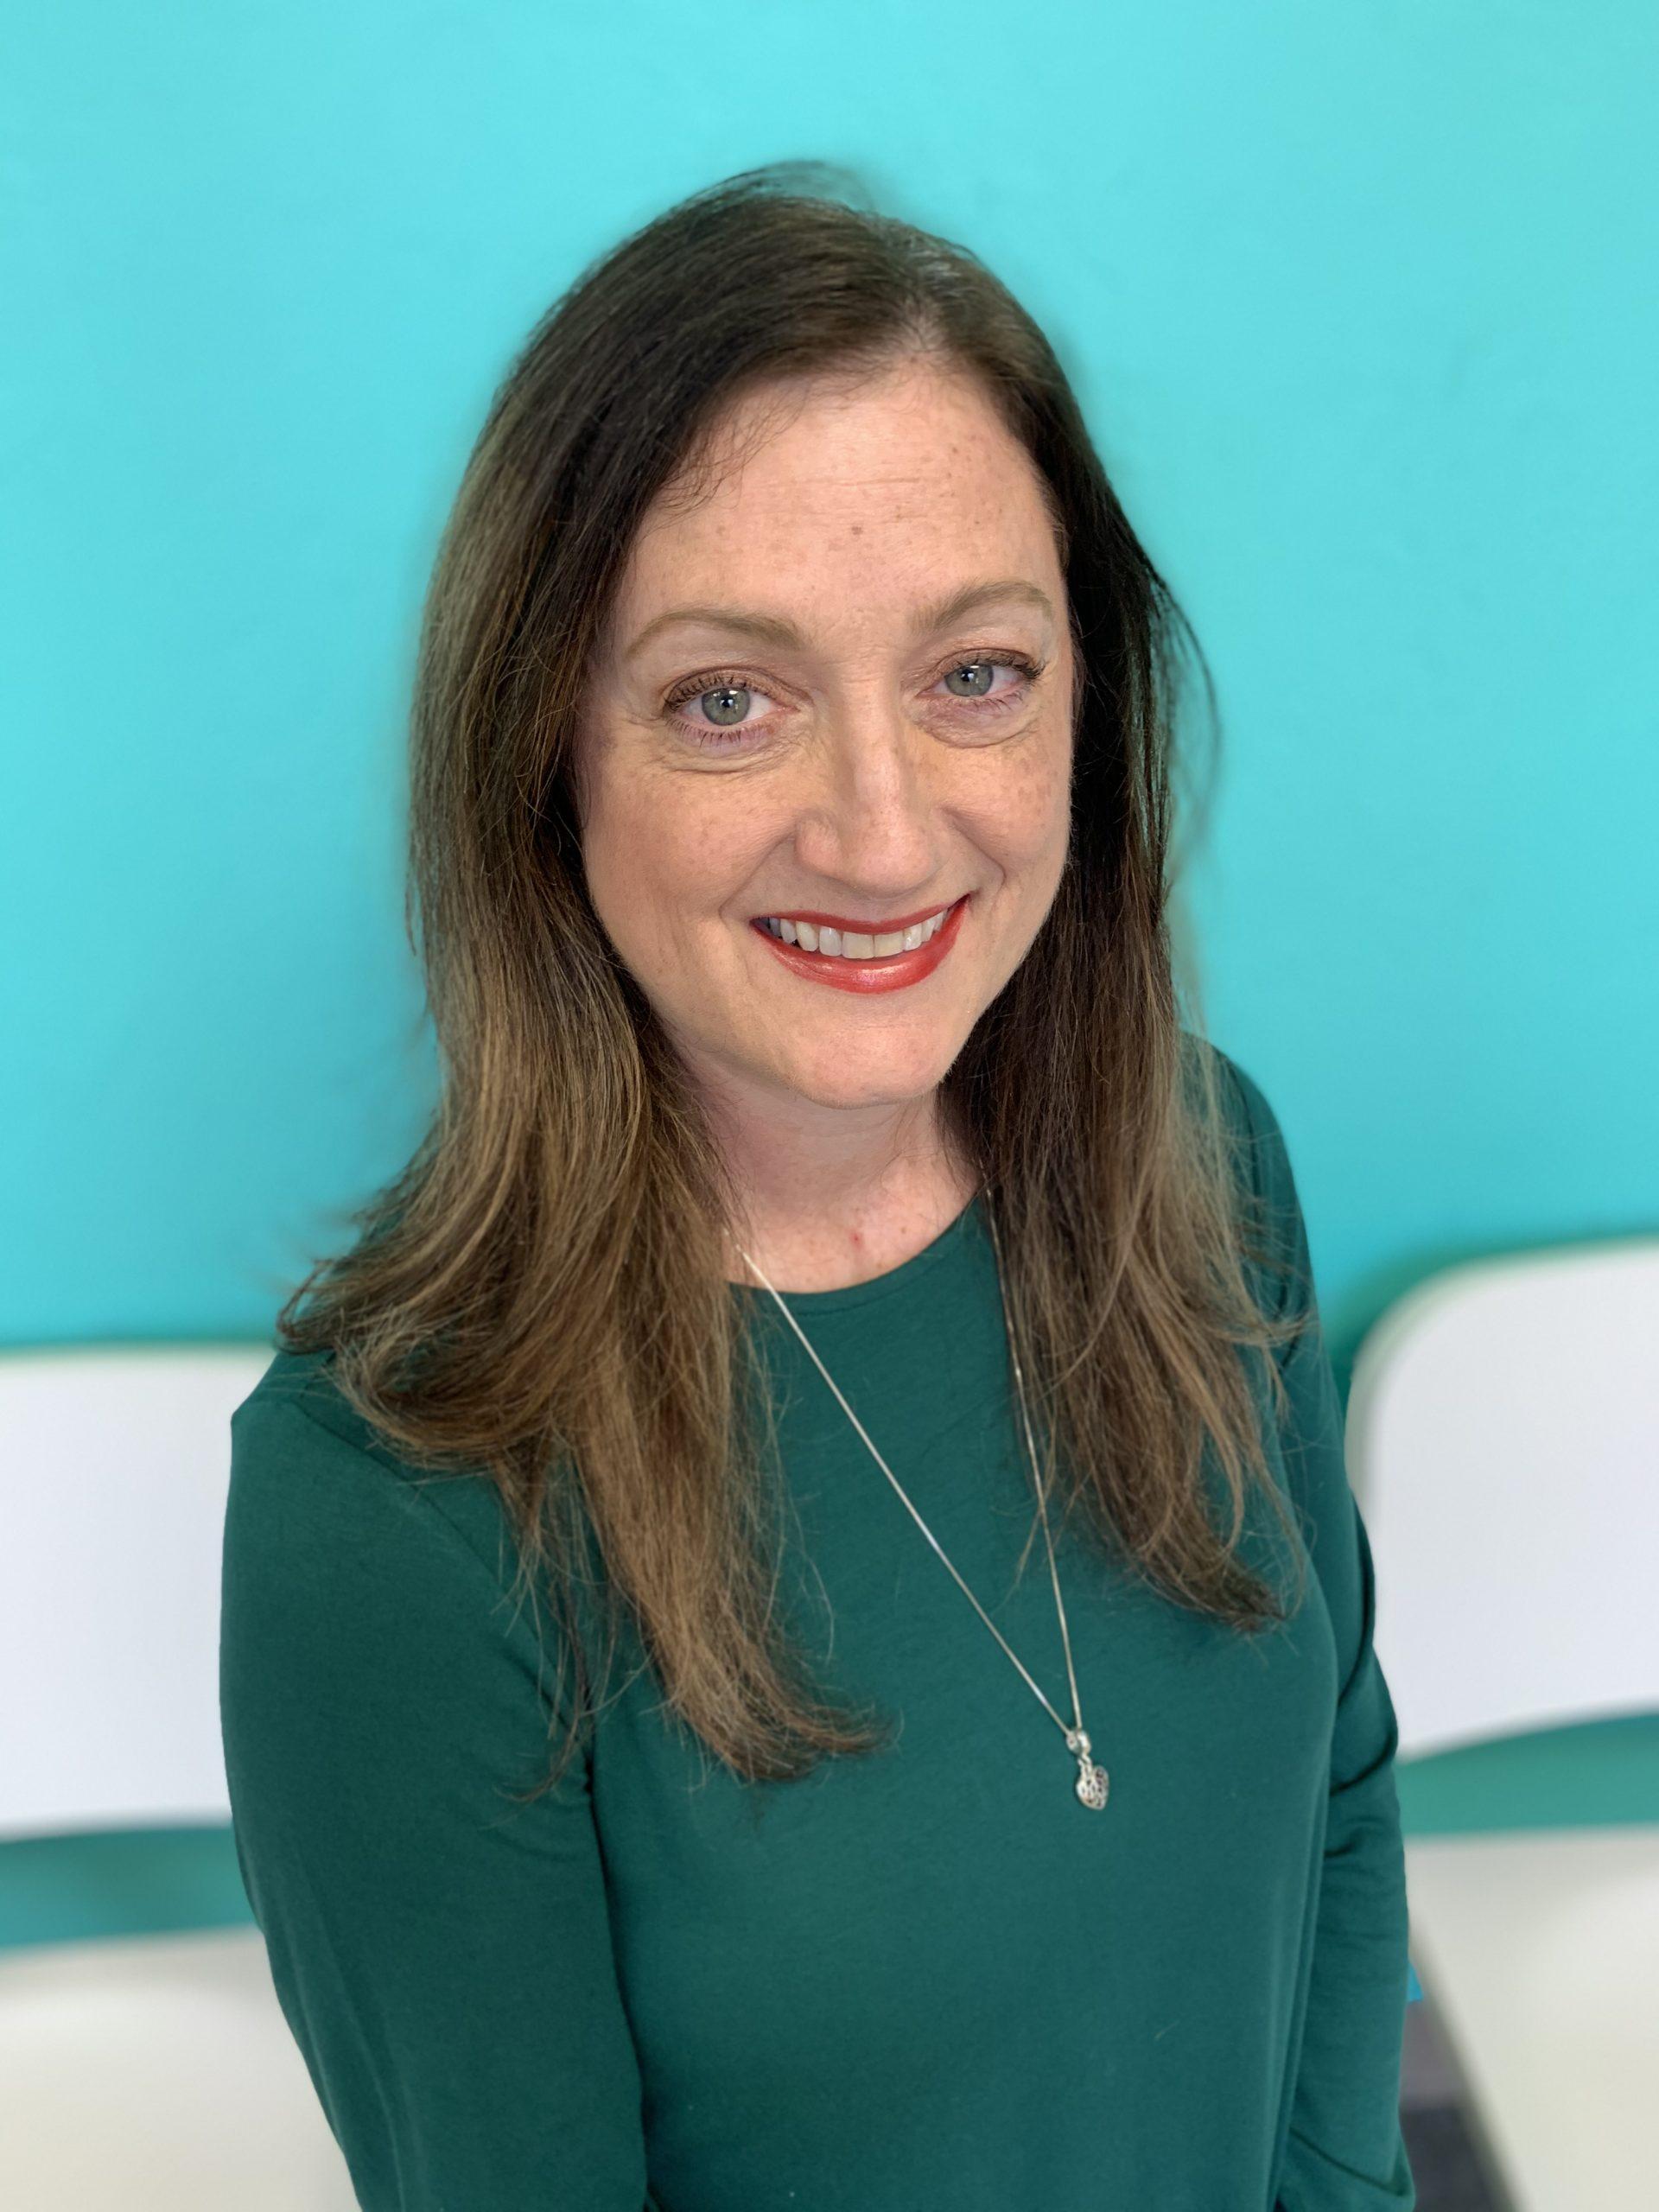 Lisa Doyle